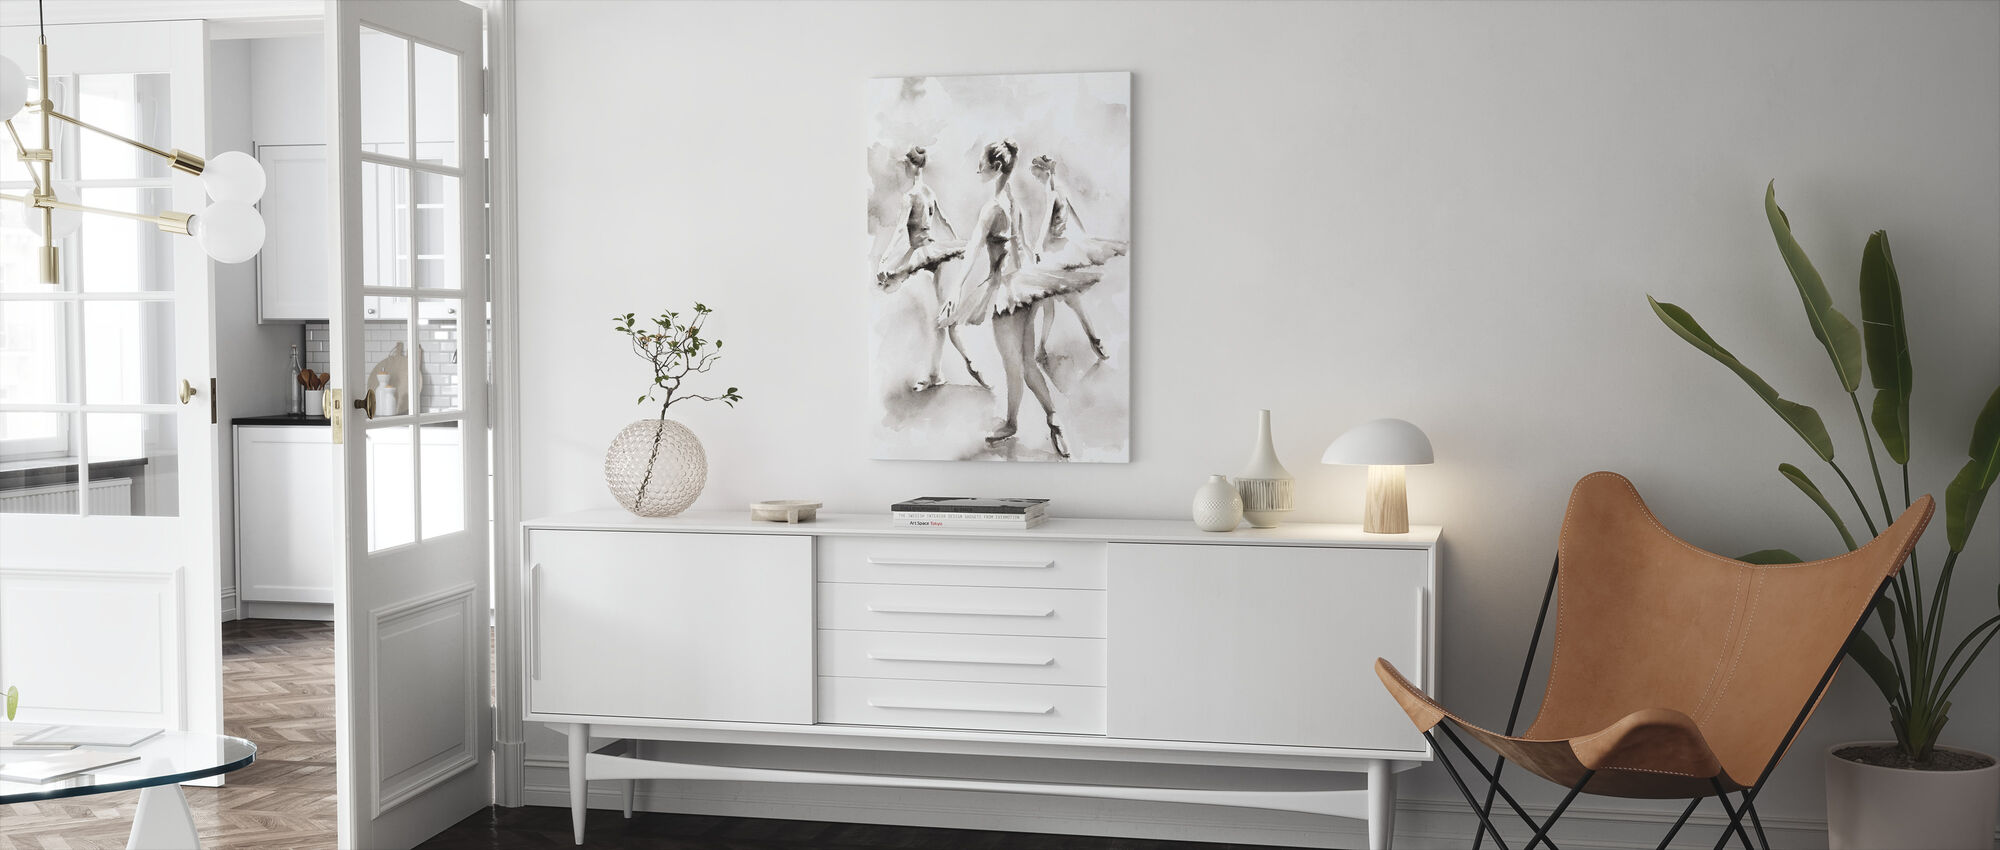 Three Ballerinas - Canvas print - Living Room